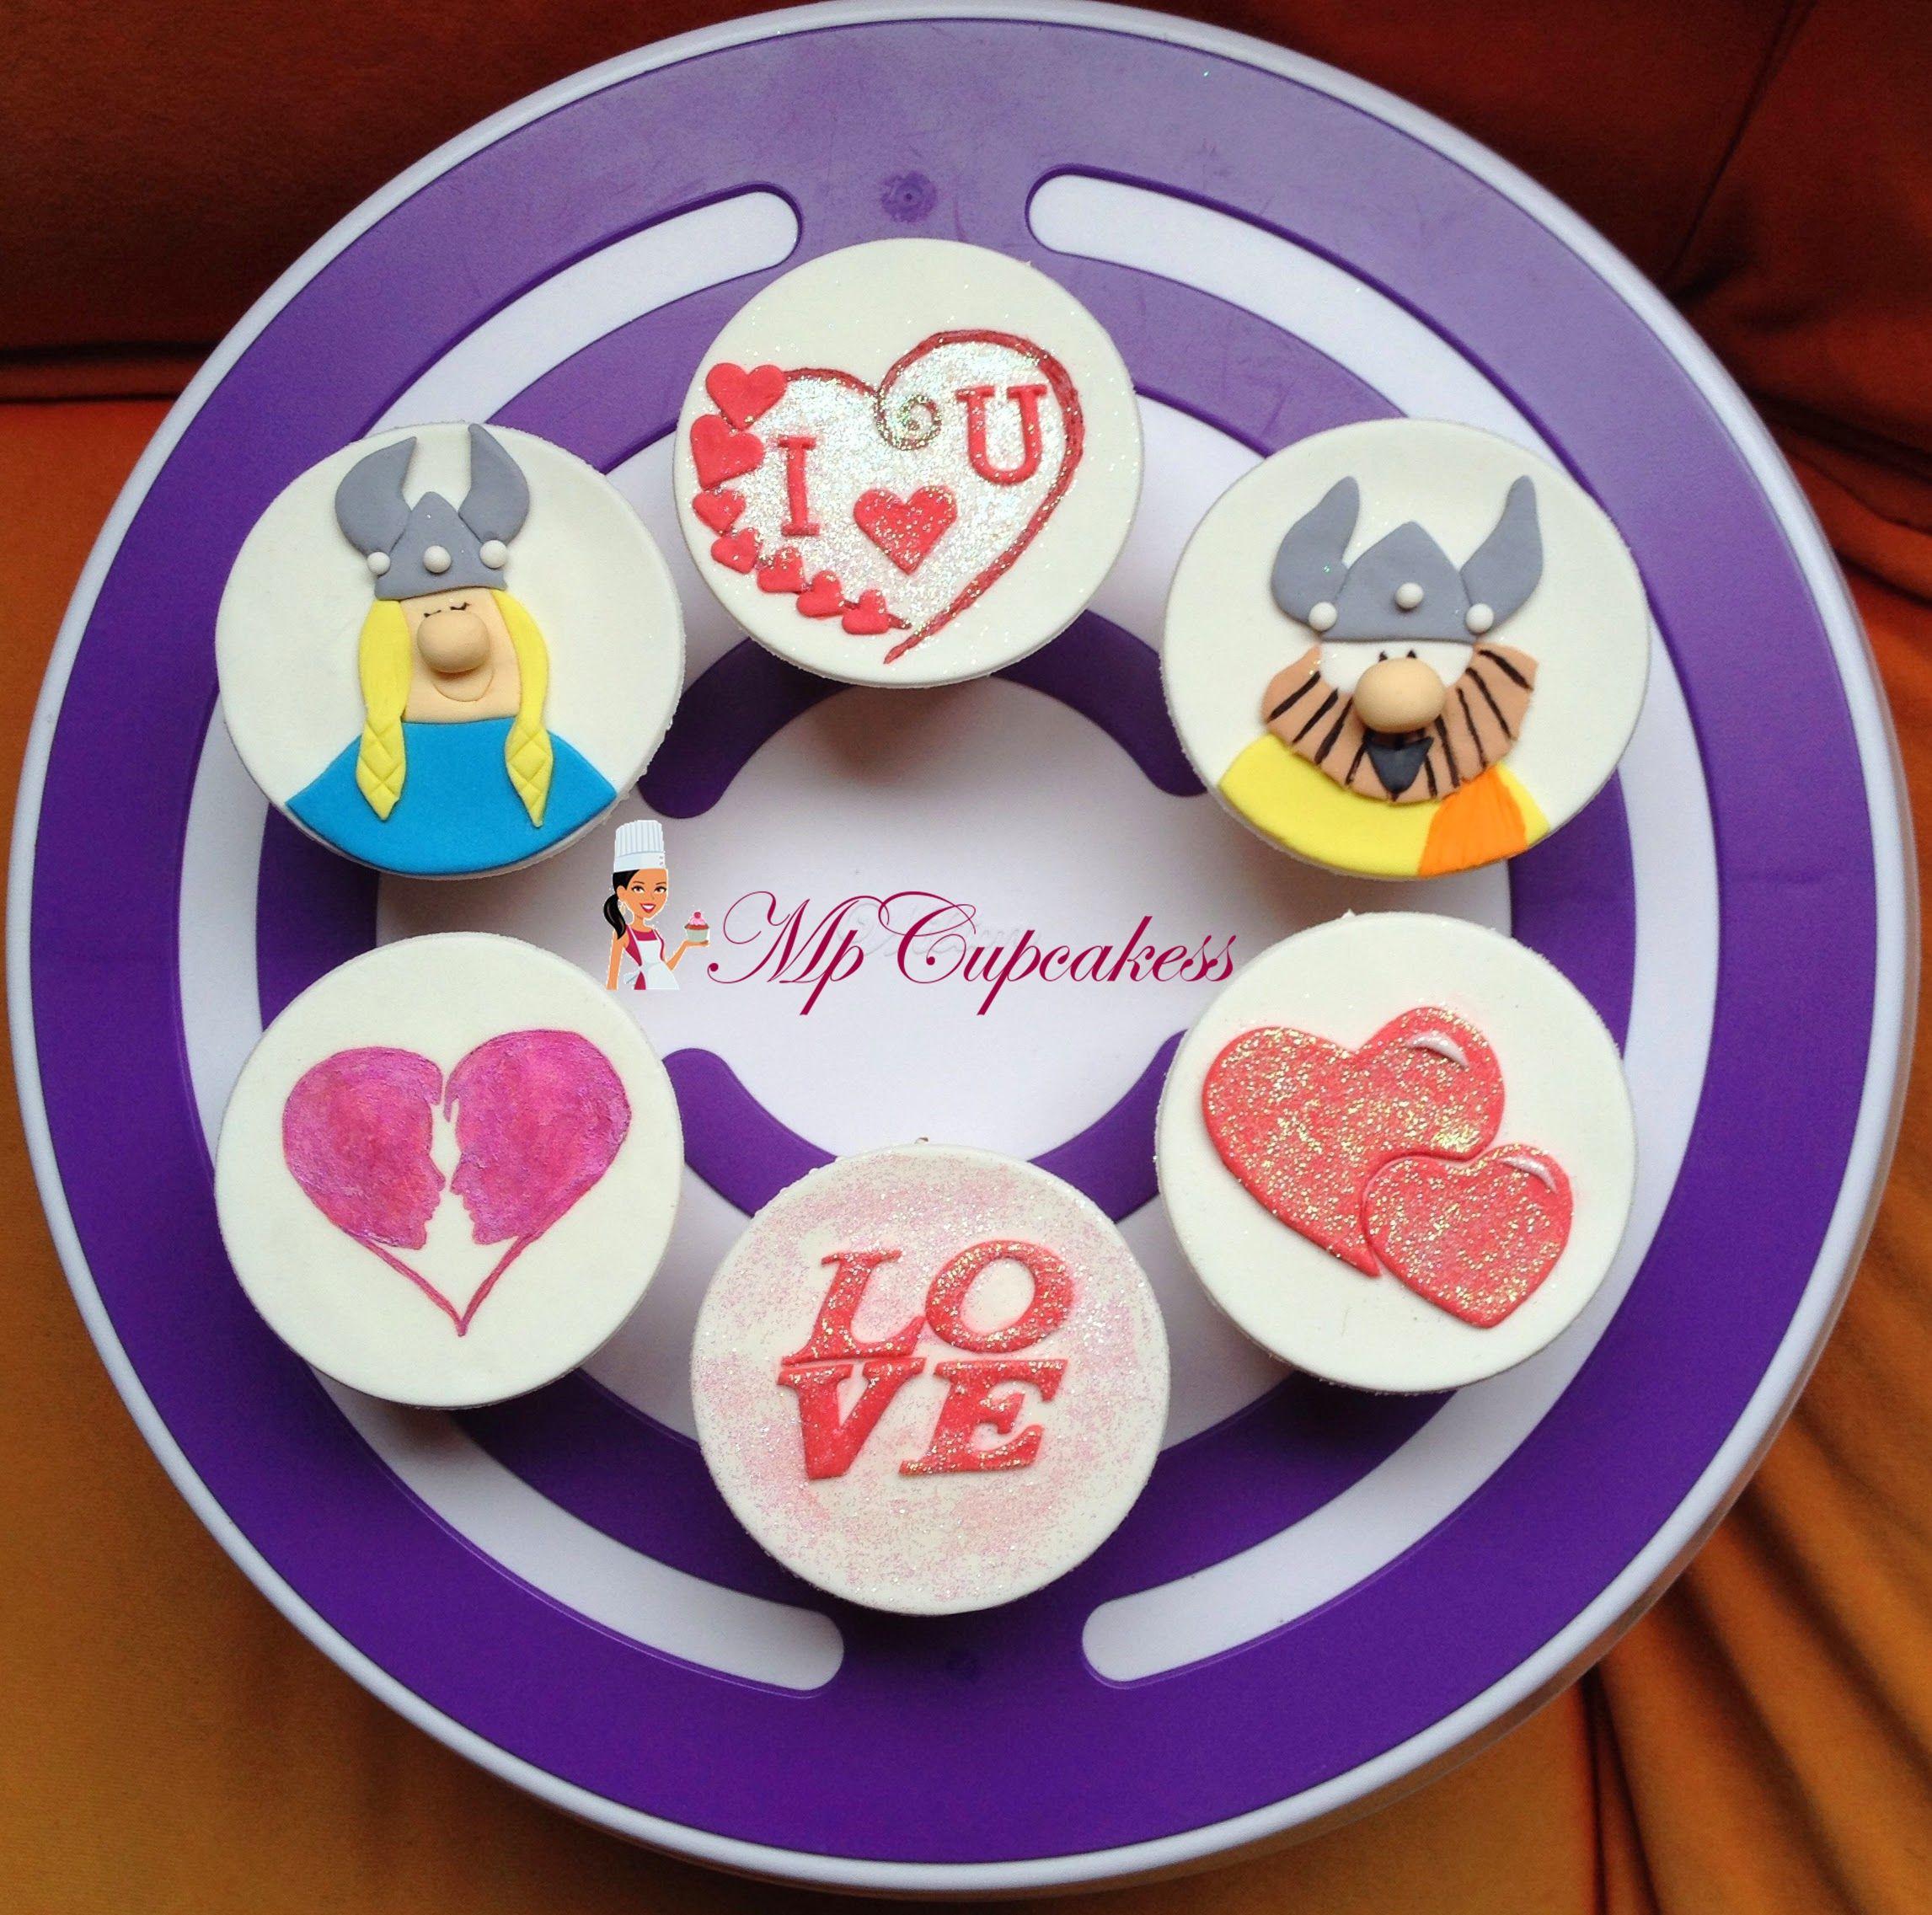 Cupcakes de amor / coroazones / Olafo